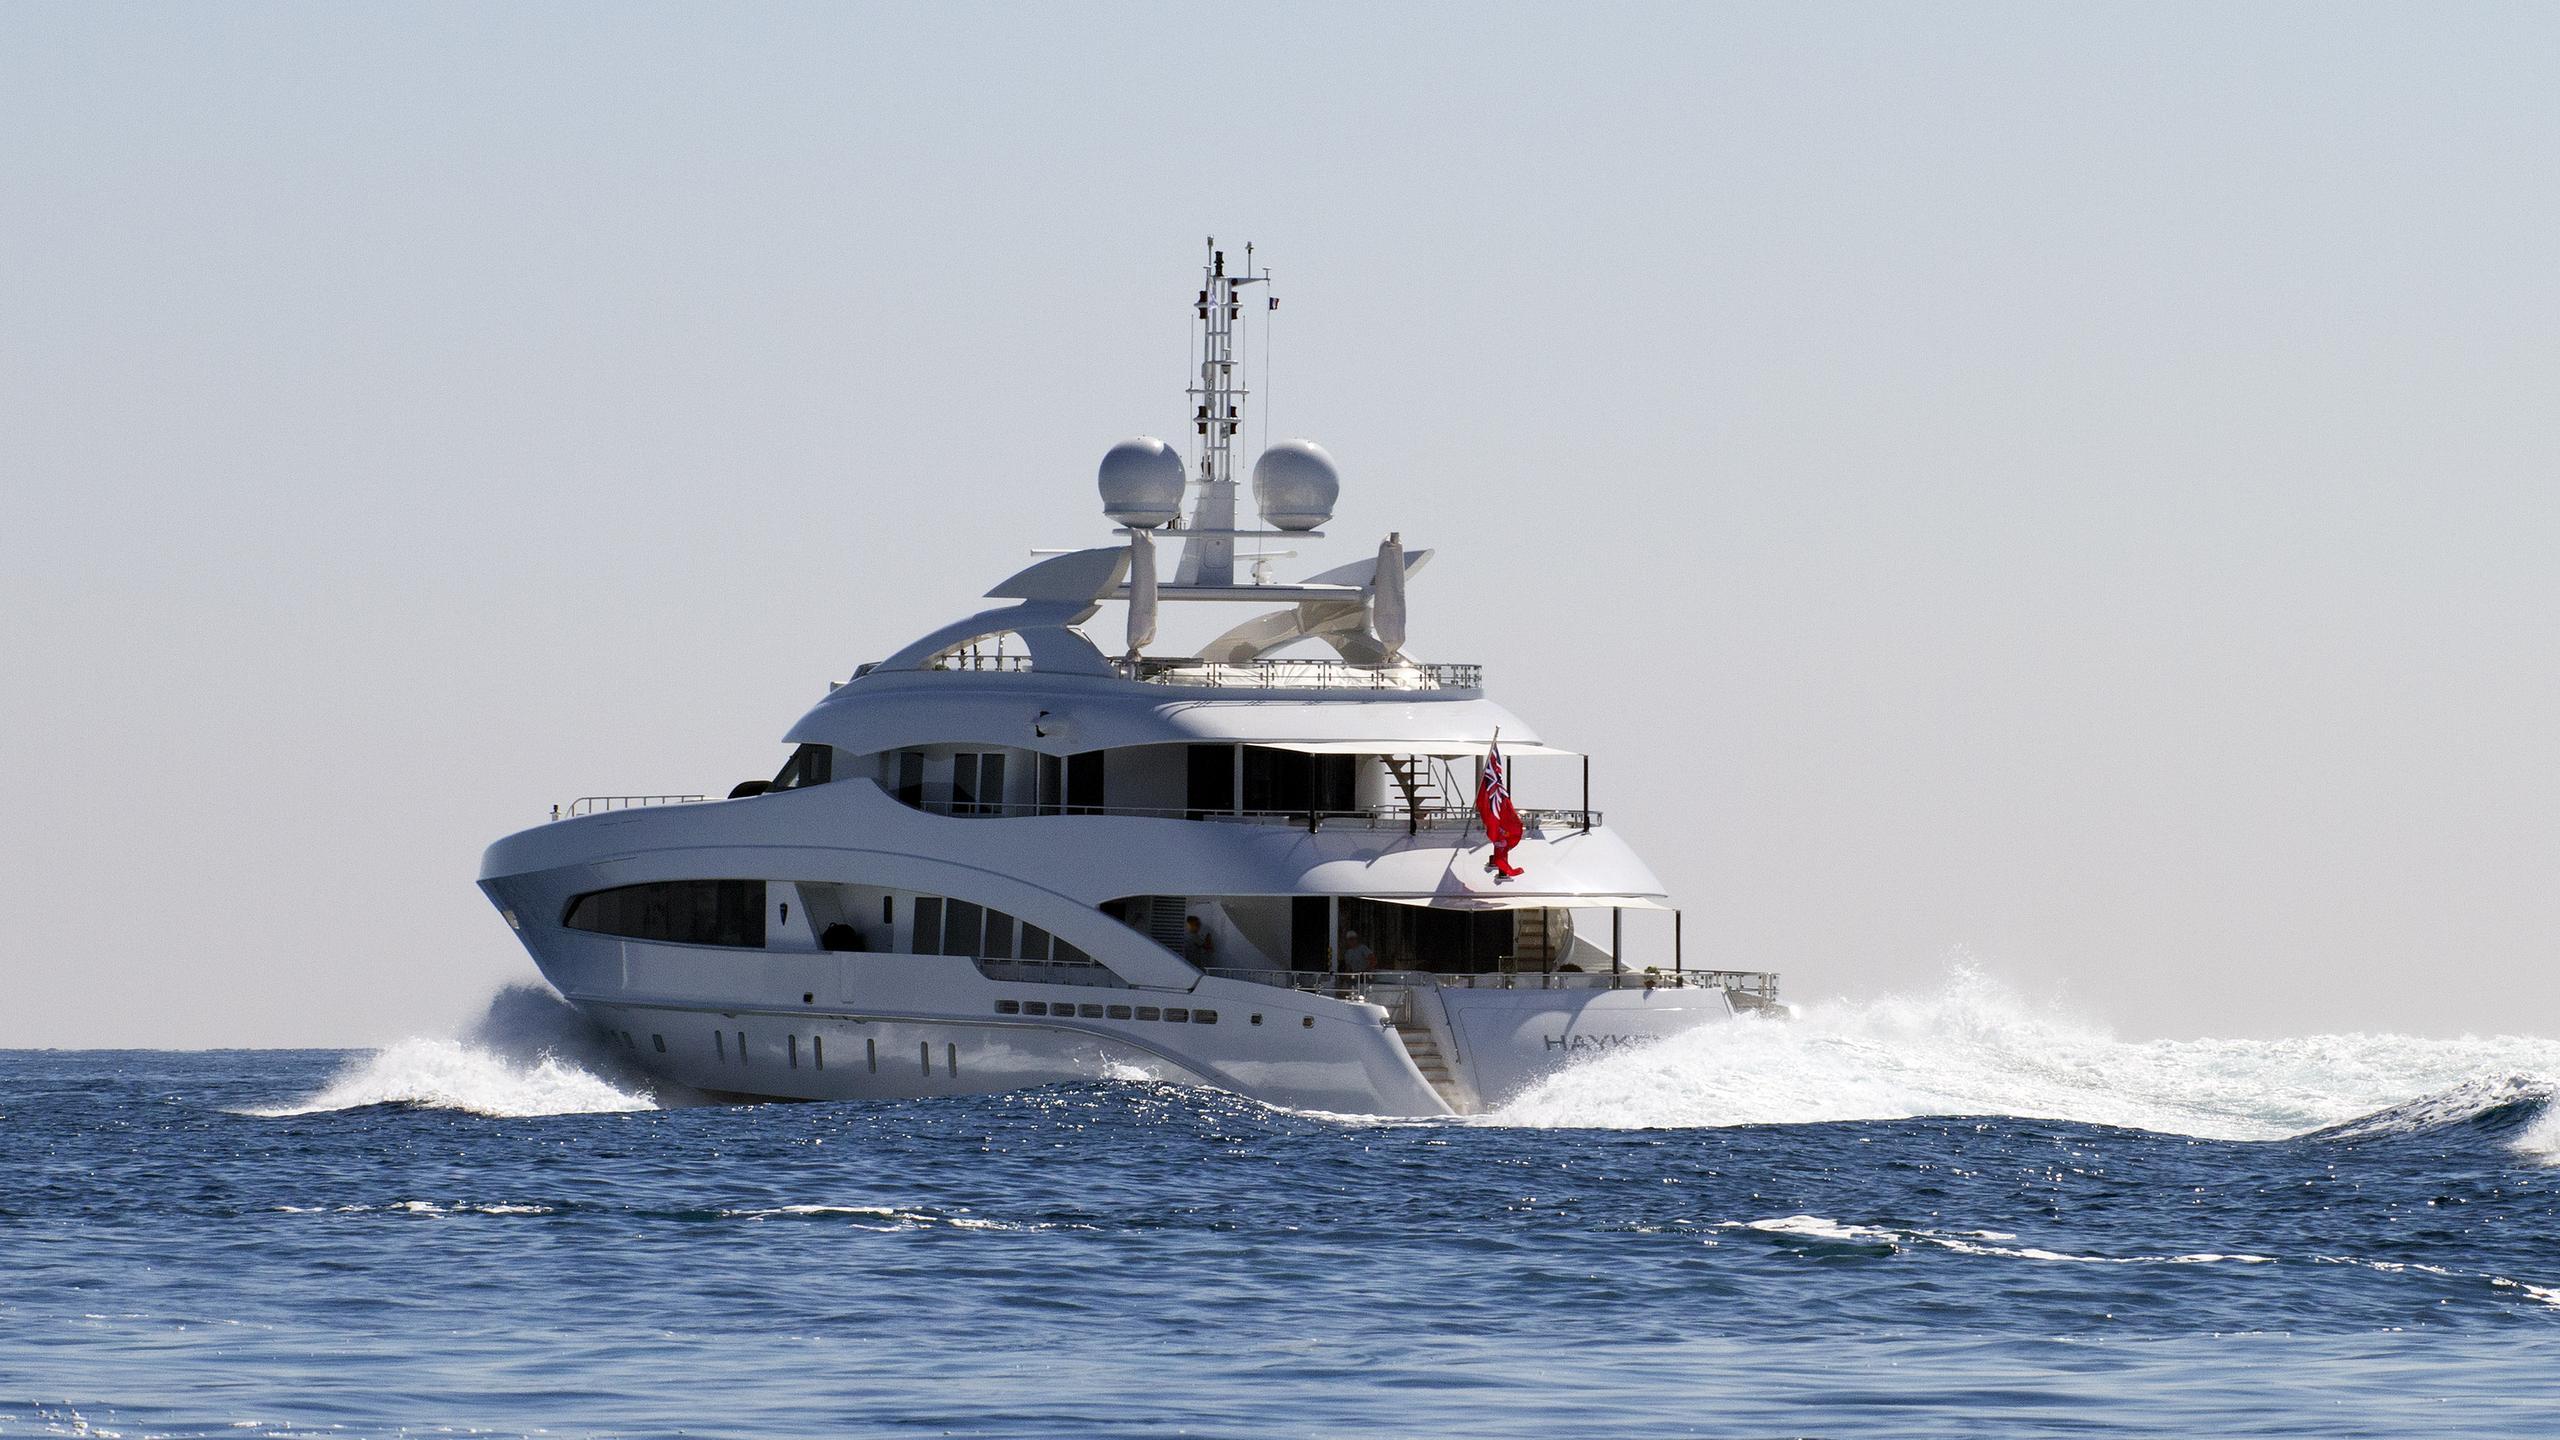 hayken-motor-yacht-heesen-2014-50m-cruising-half-stern